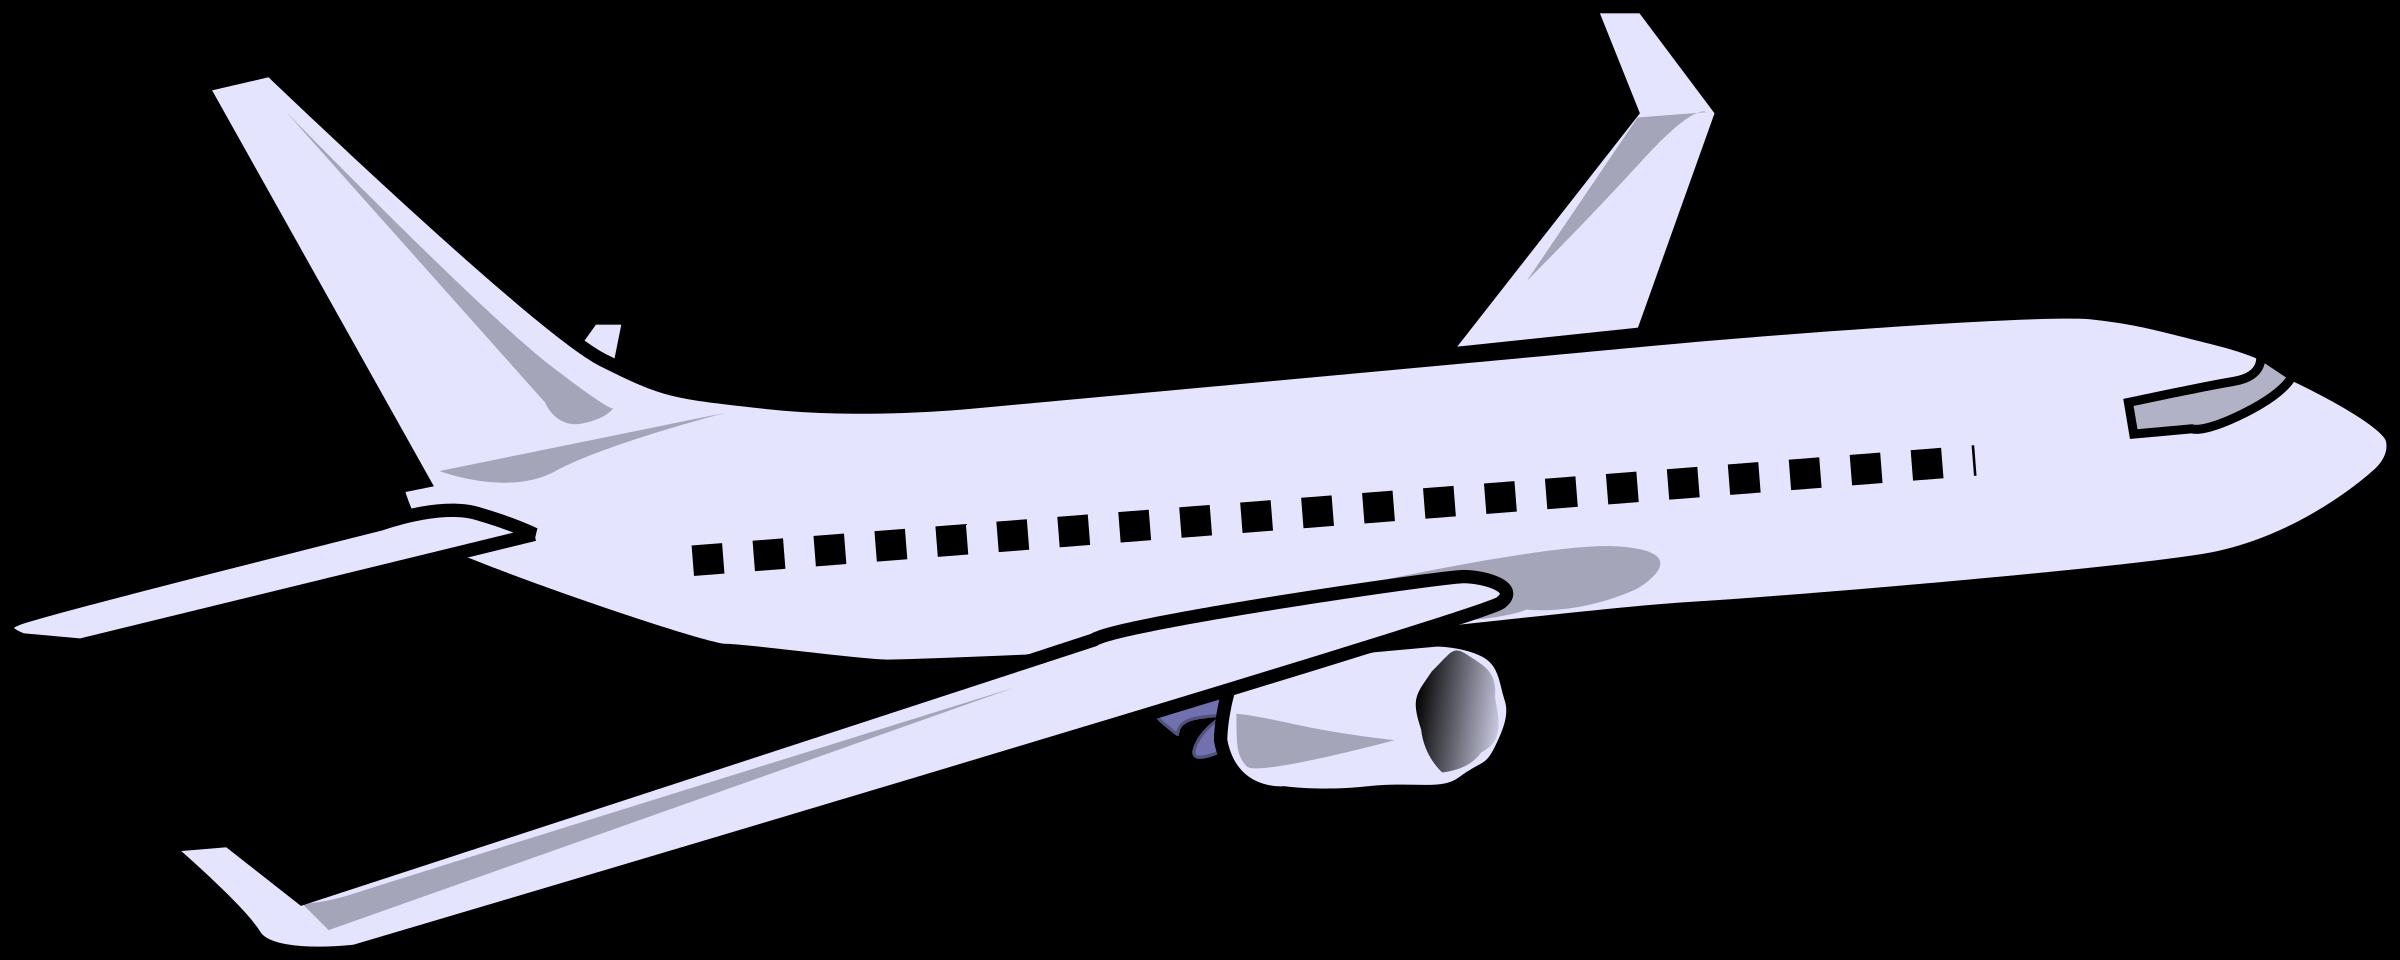 Aviation clipart travel Clipart Aircraft Aircraft